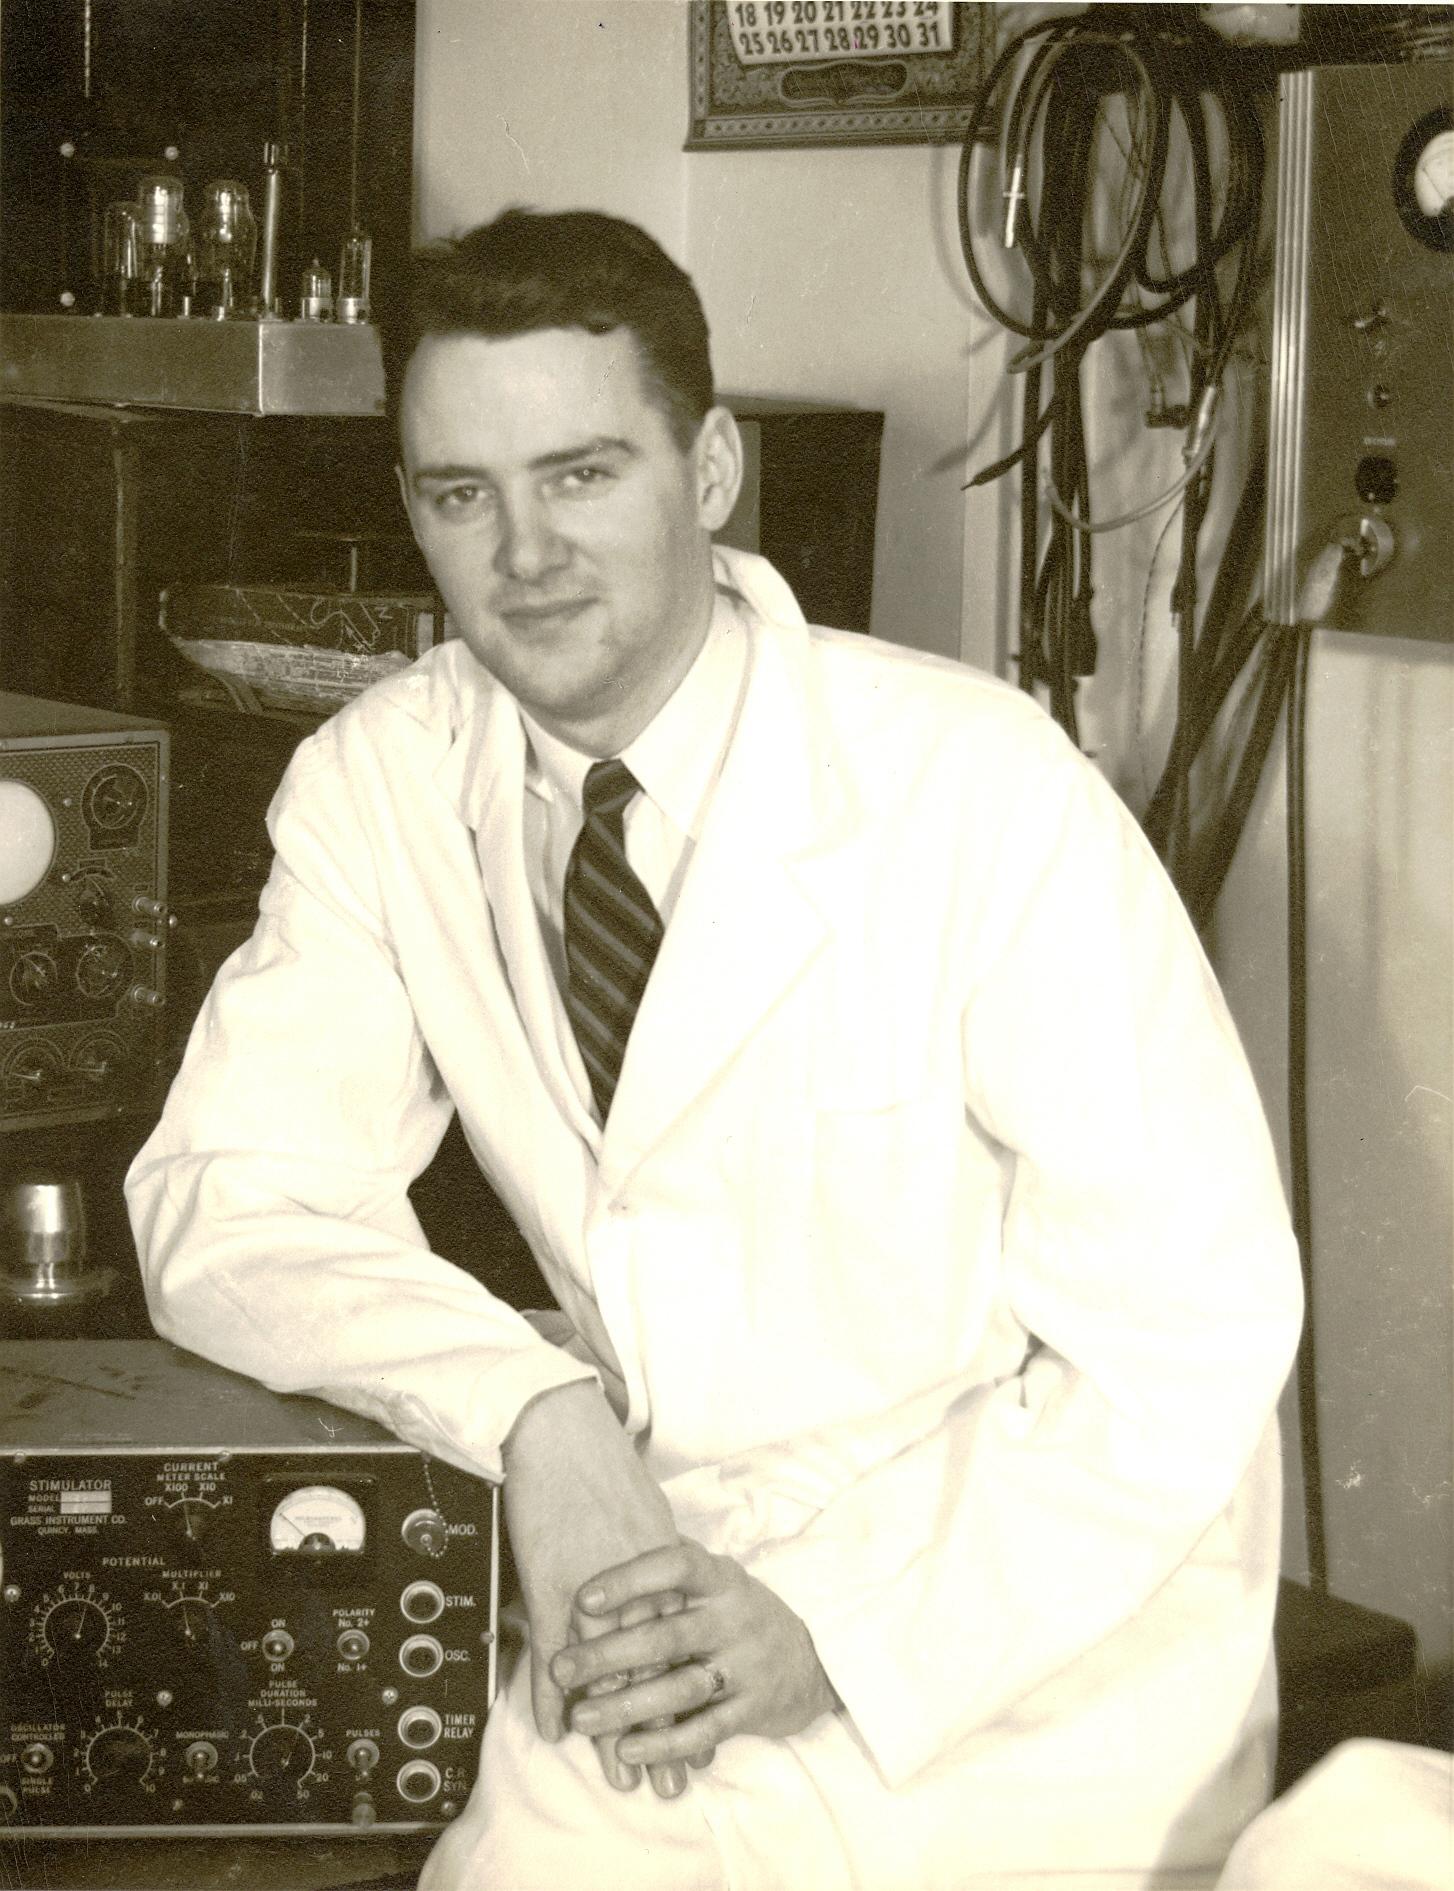 Portrait of Dr. John Carter Callaghan